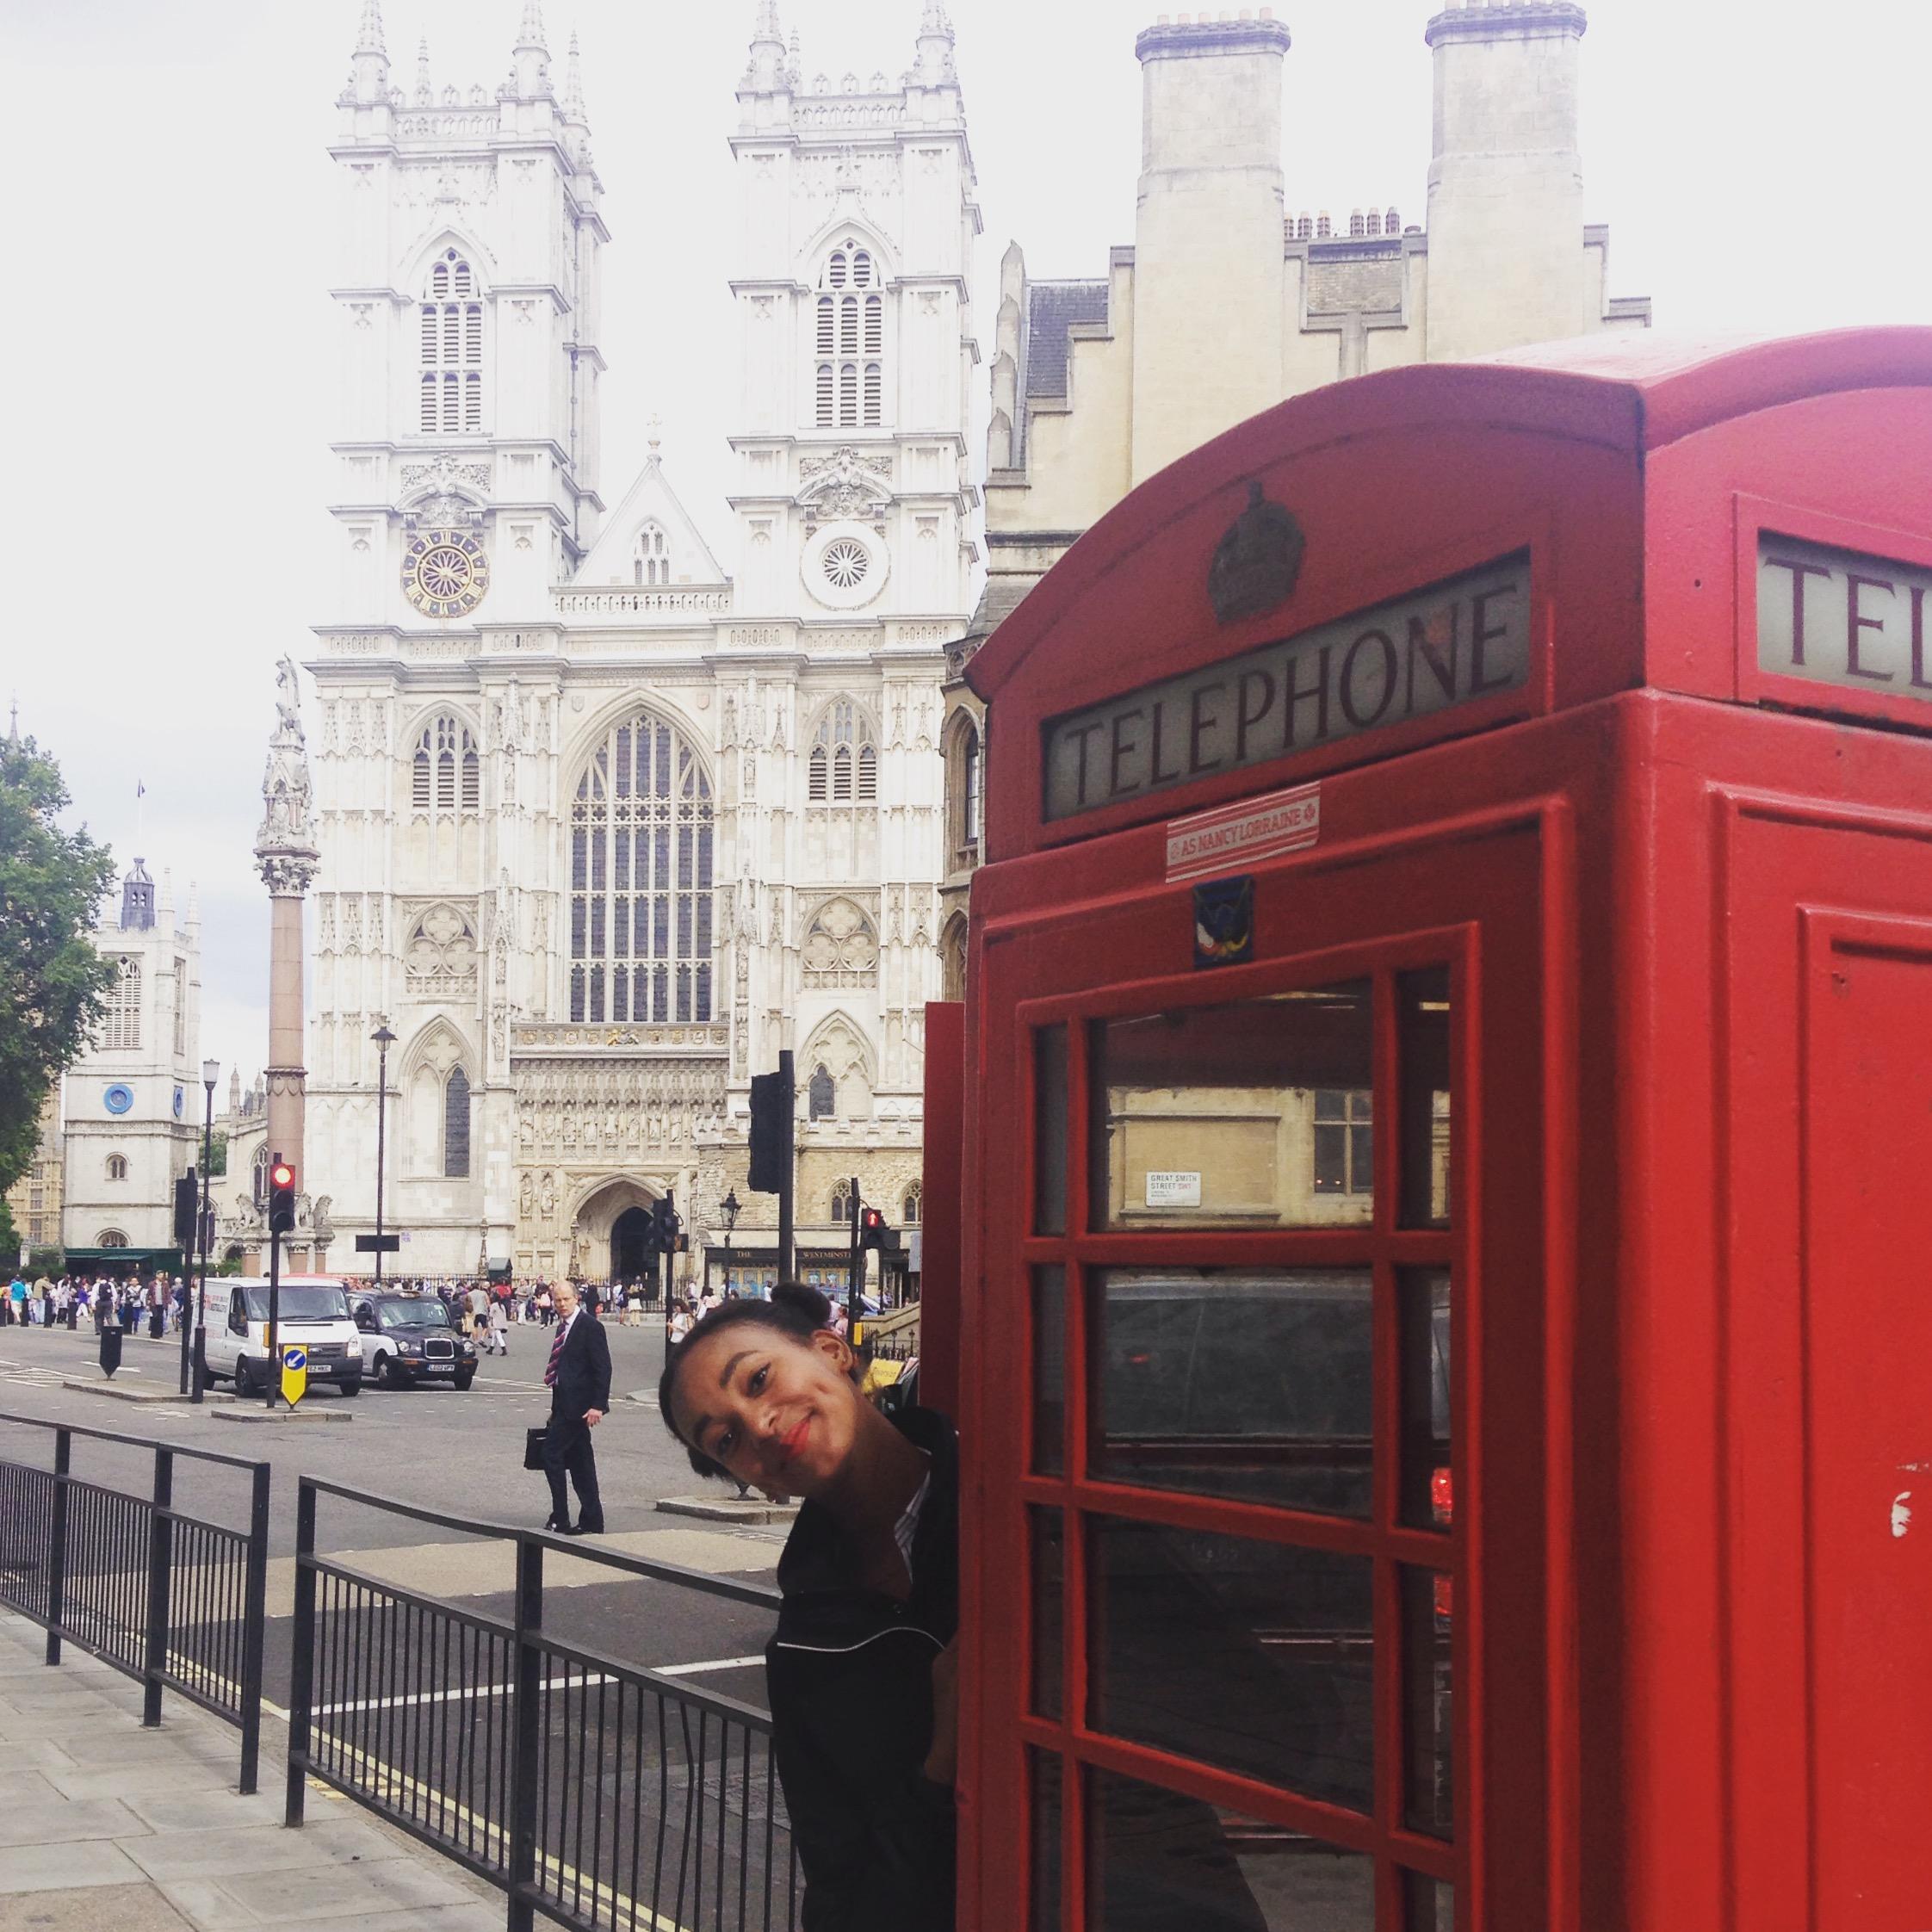 london-telephone-booth-red-olivia-christine